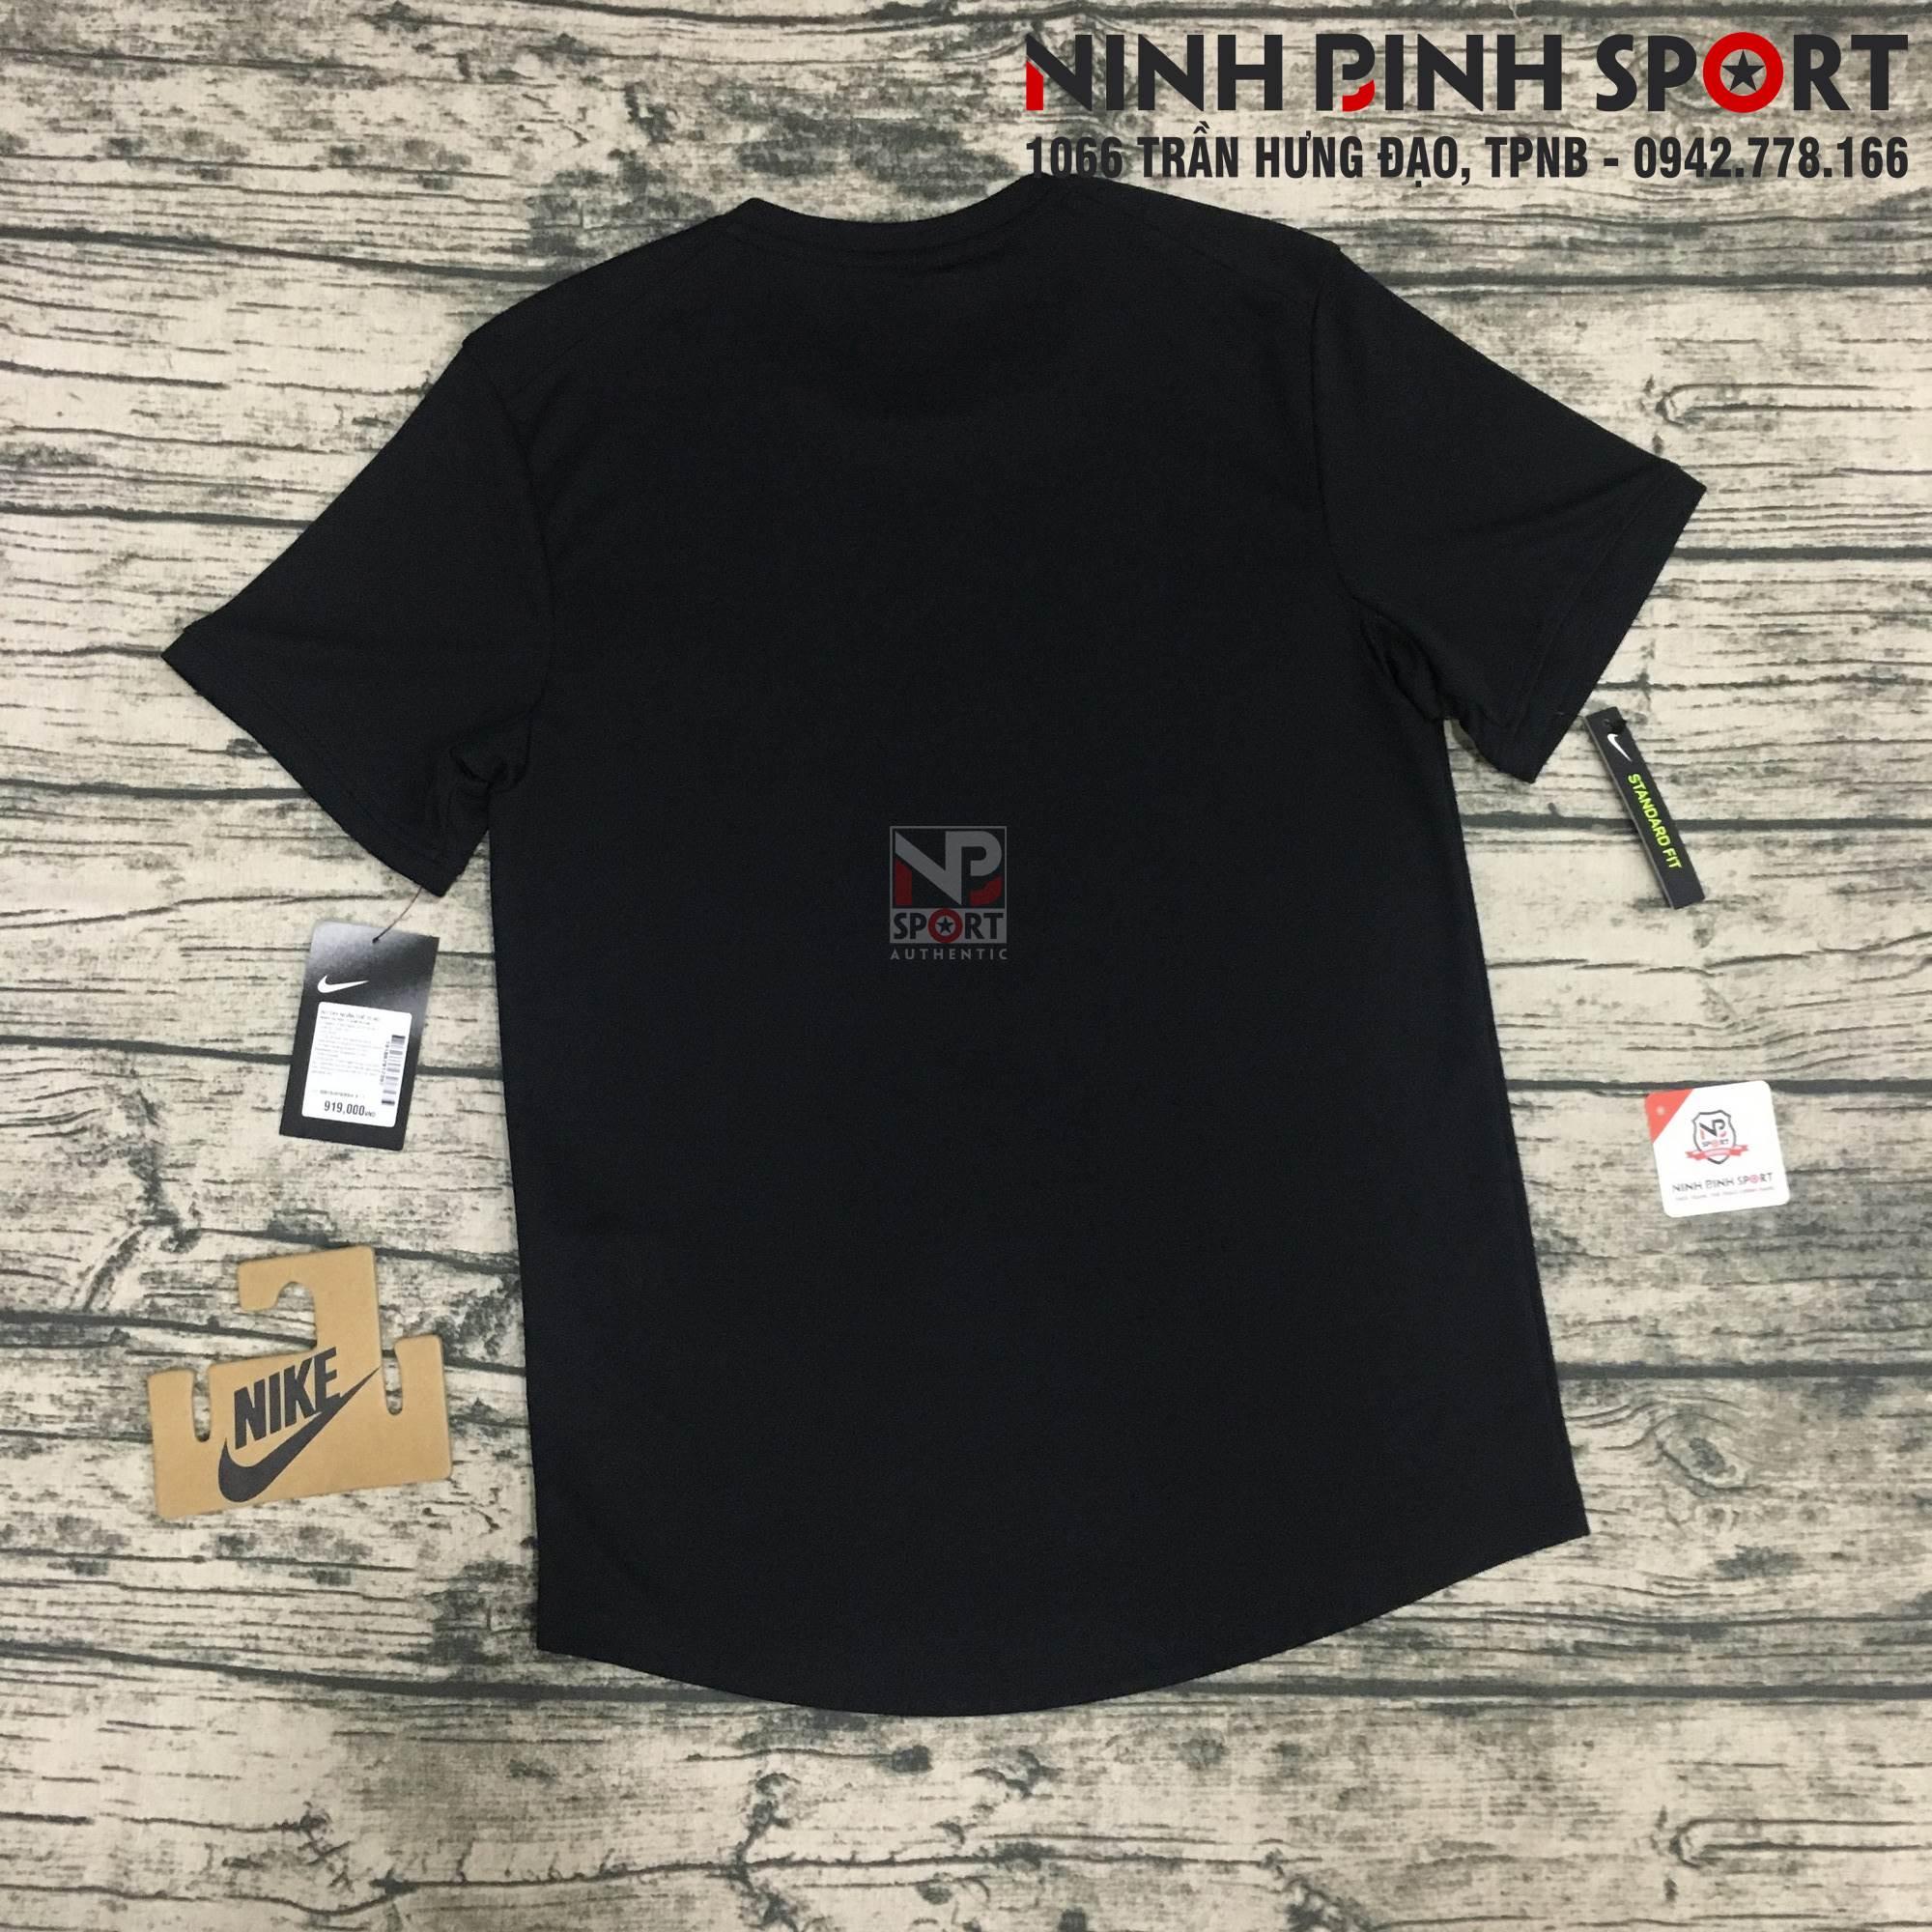 Áo thể thao nam Nike Dri-Fit S/S Top Black 939135-010